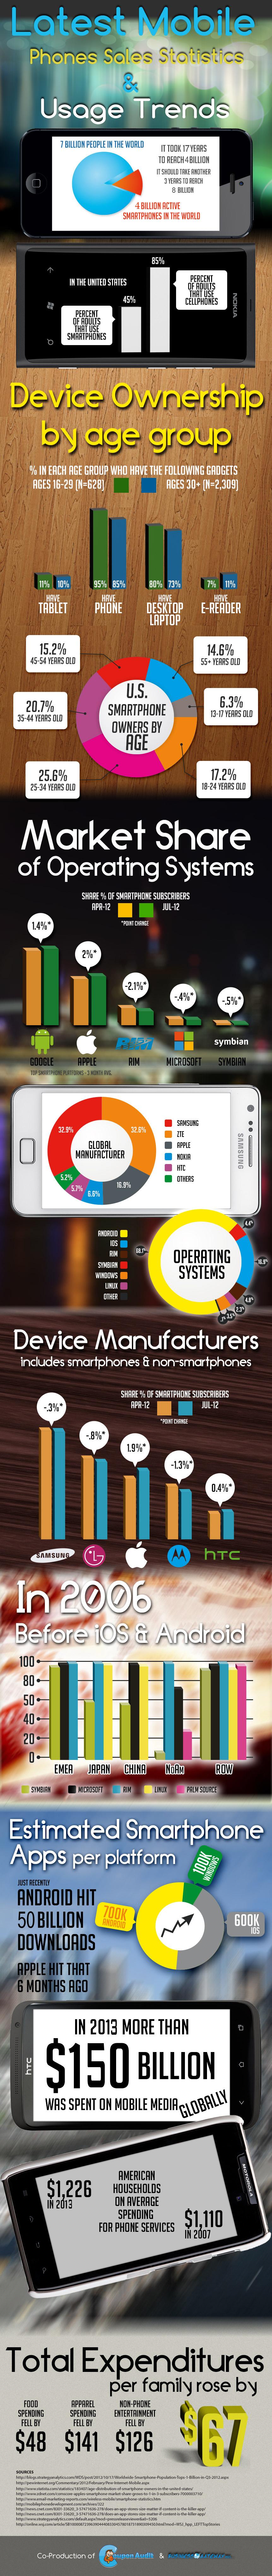 Latest Mobile Phones Sales Statistics & Usage Trends